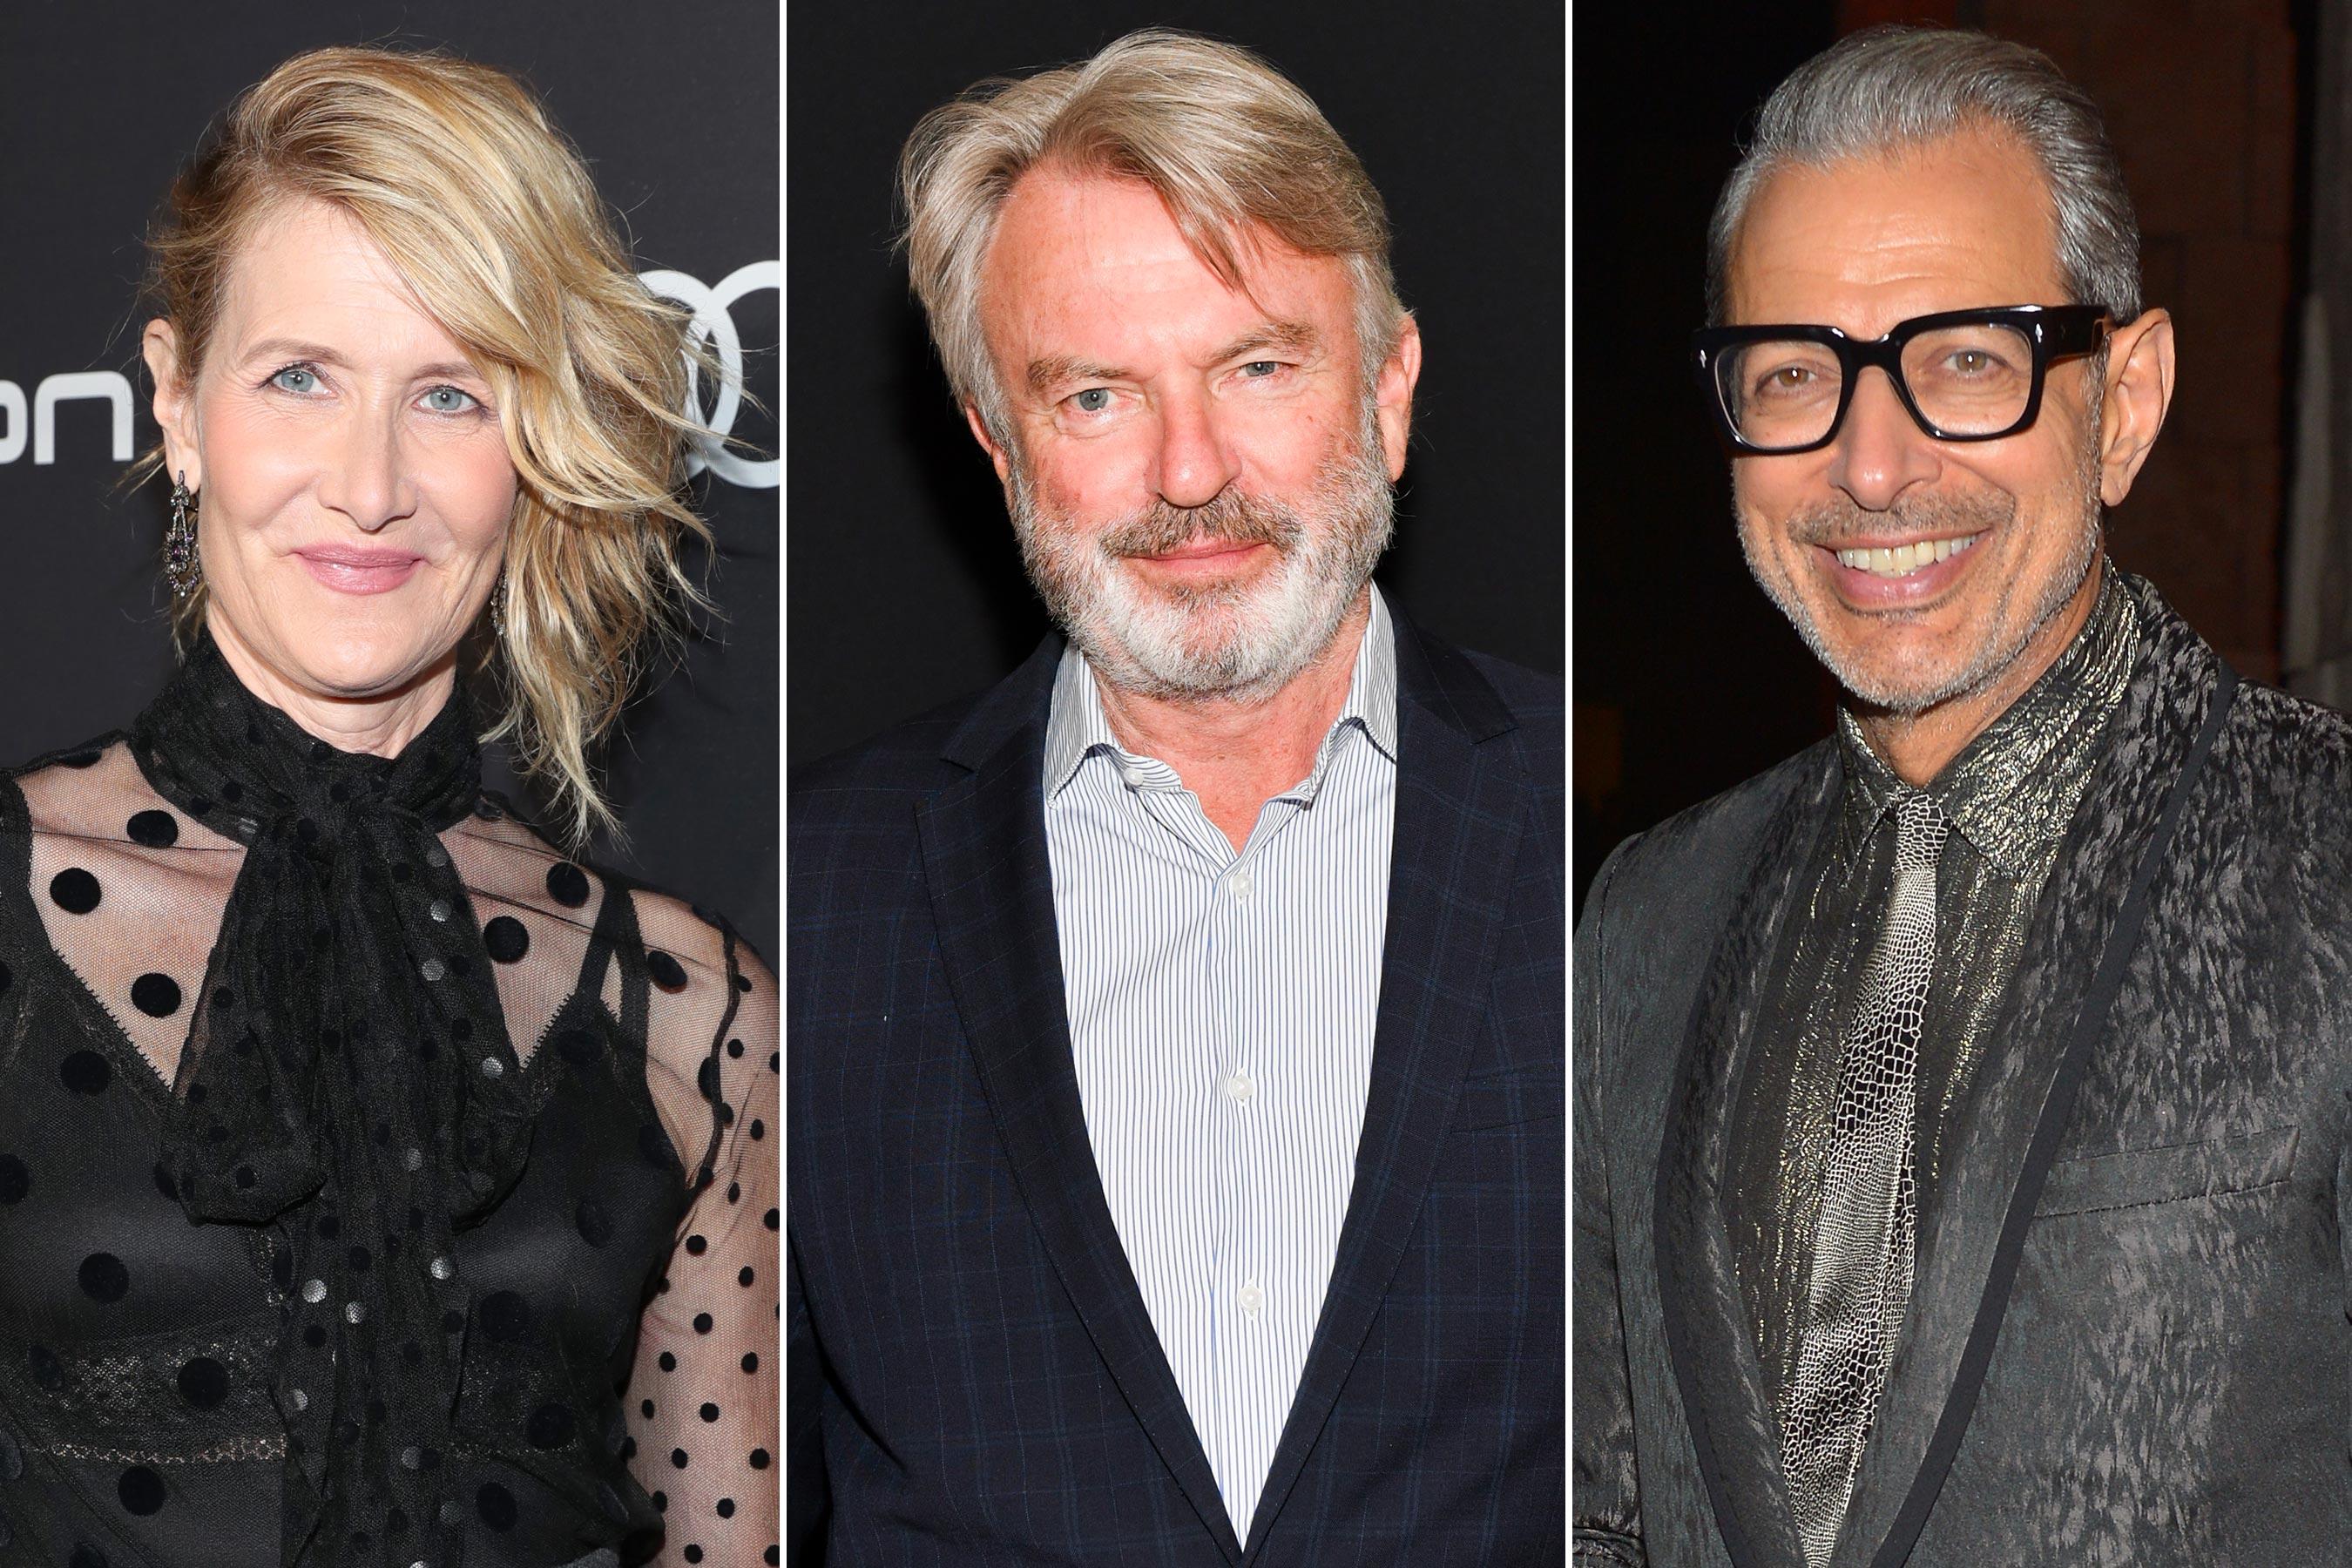 ¡Bomba nostálgica! Sam Neill, Jeff Goldblum y Laura Dern regresan para Jurassic World 3 - Radio Cantilo